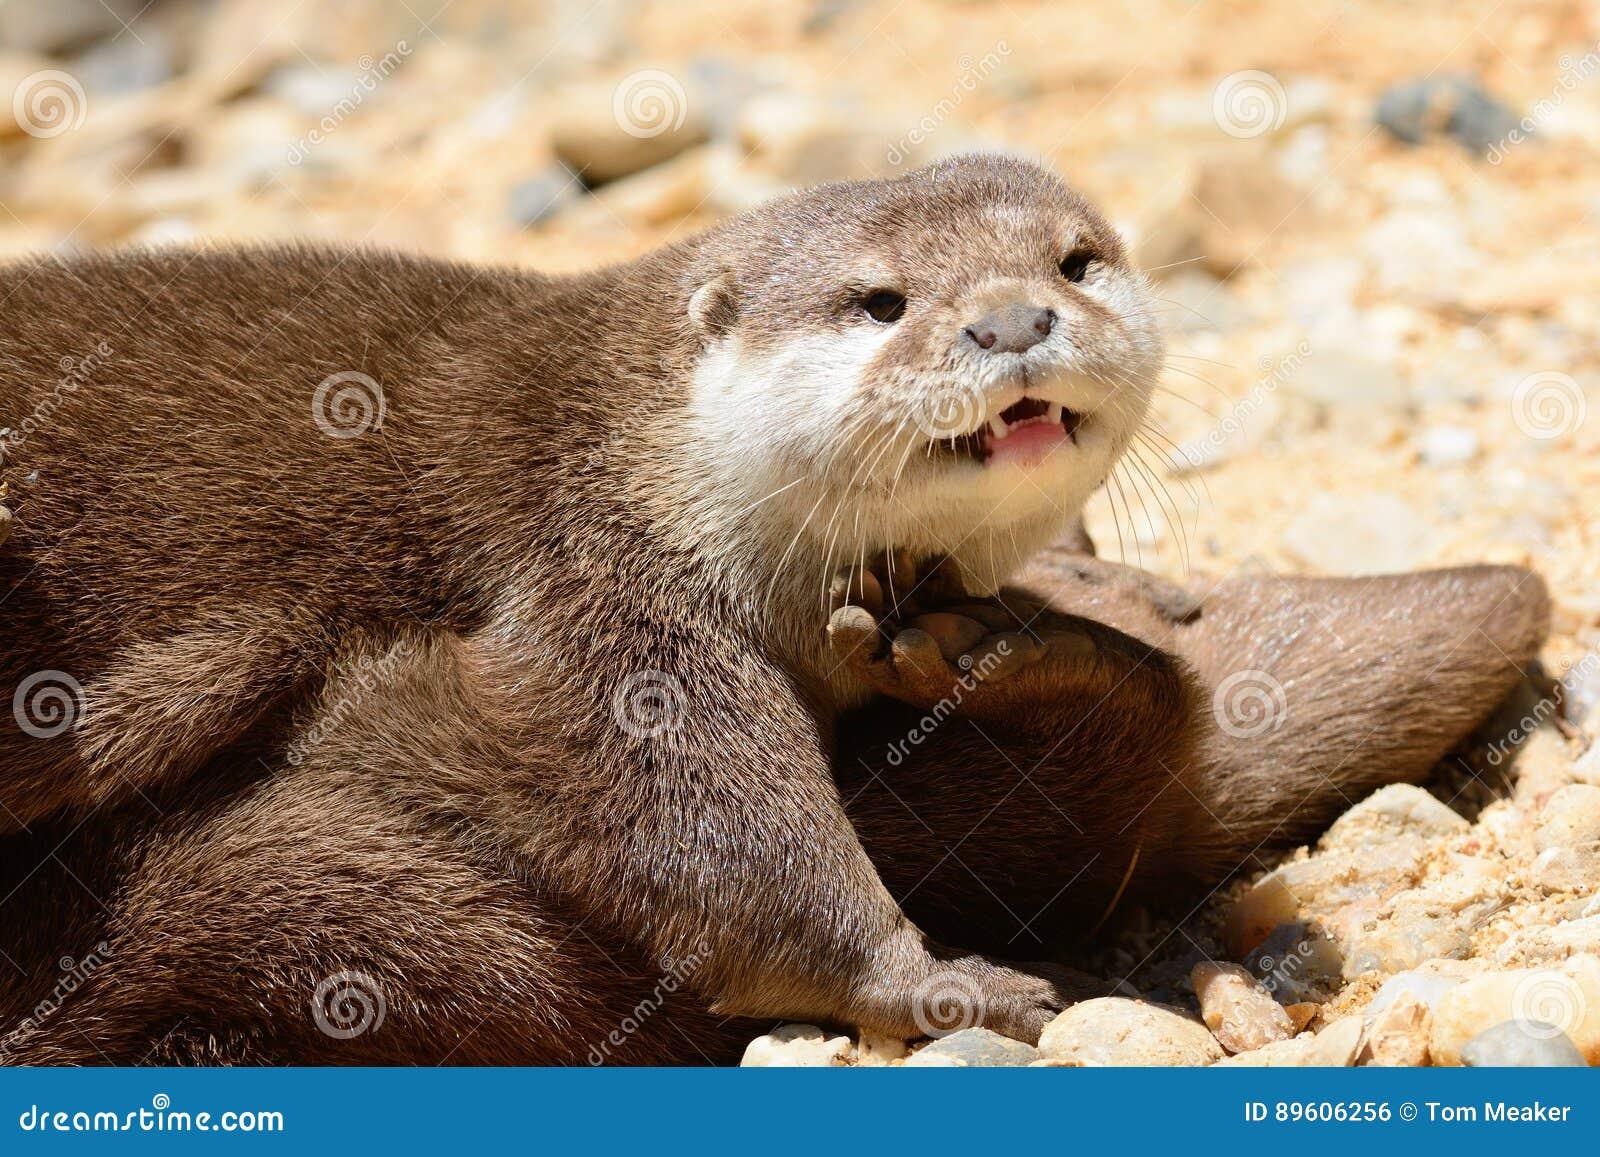 Otter up close